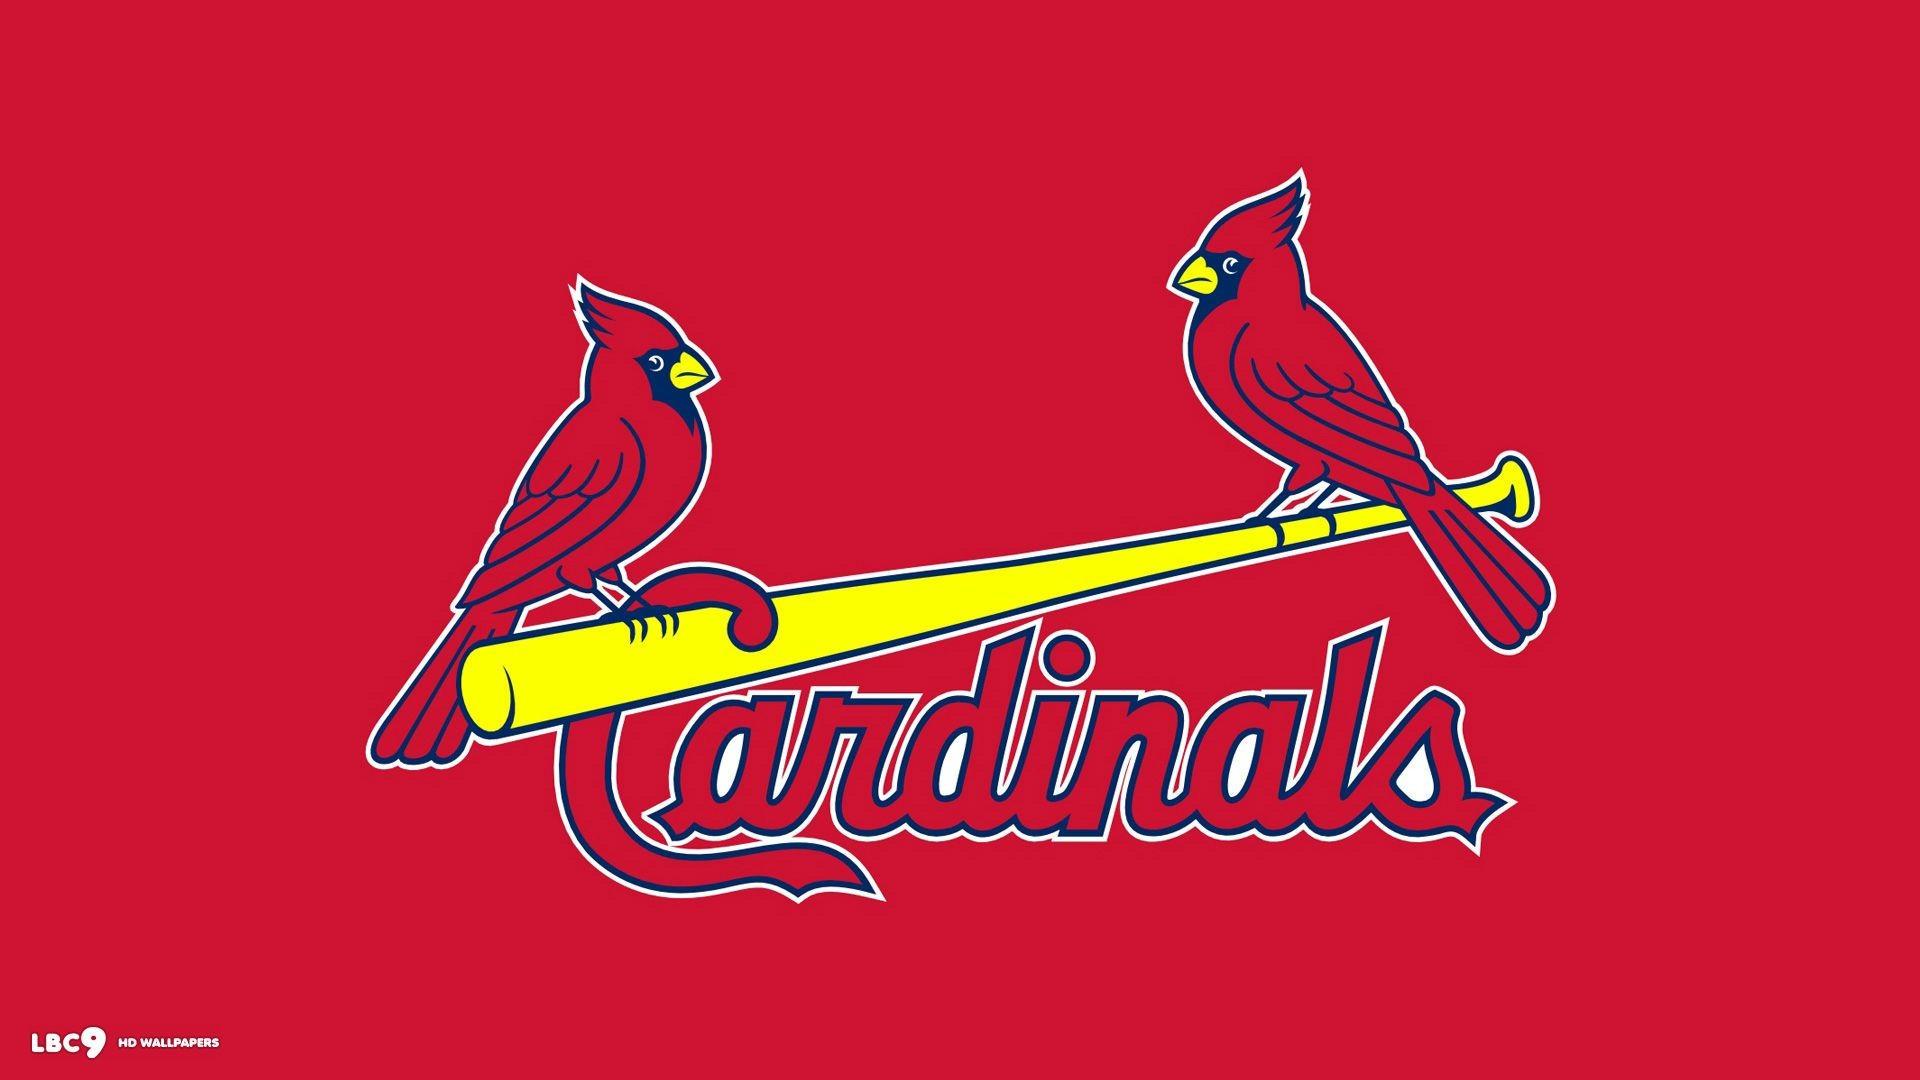 Res: 1920x1080, St Louis Cardinals Desktop Wallpapers Wallpaper 1024×576 St Louis Cardinals  Wallpaper (23 Wallpapers)   Adorable Wallpapers